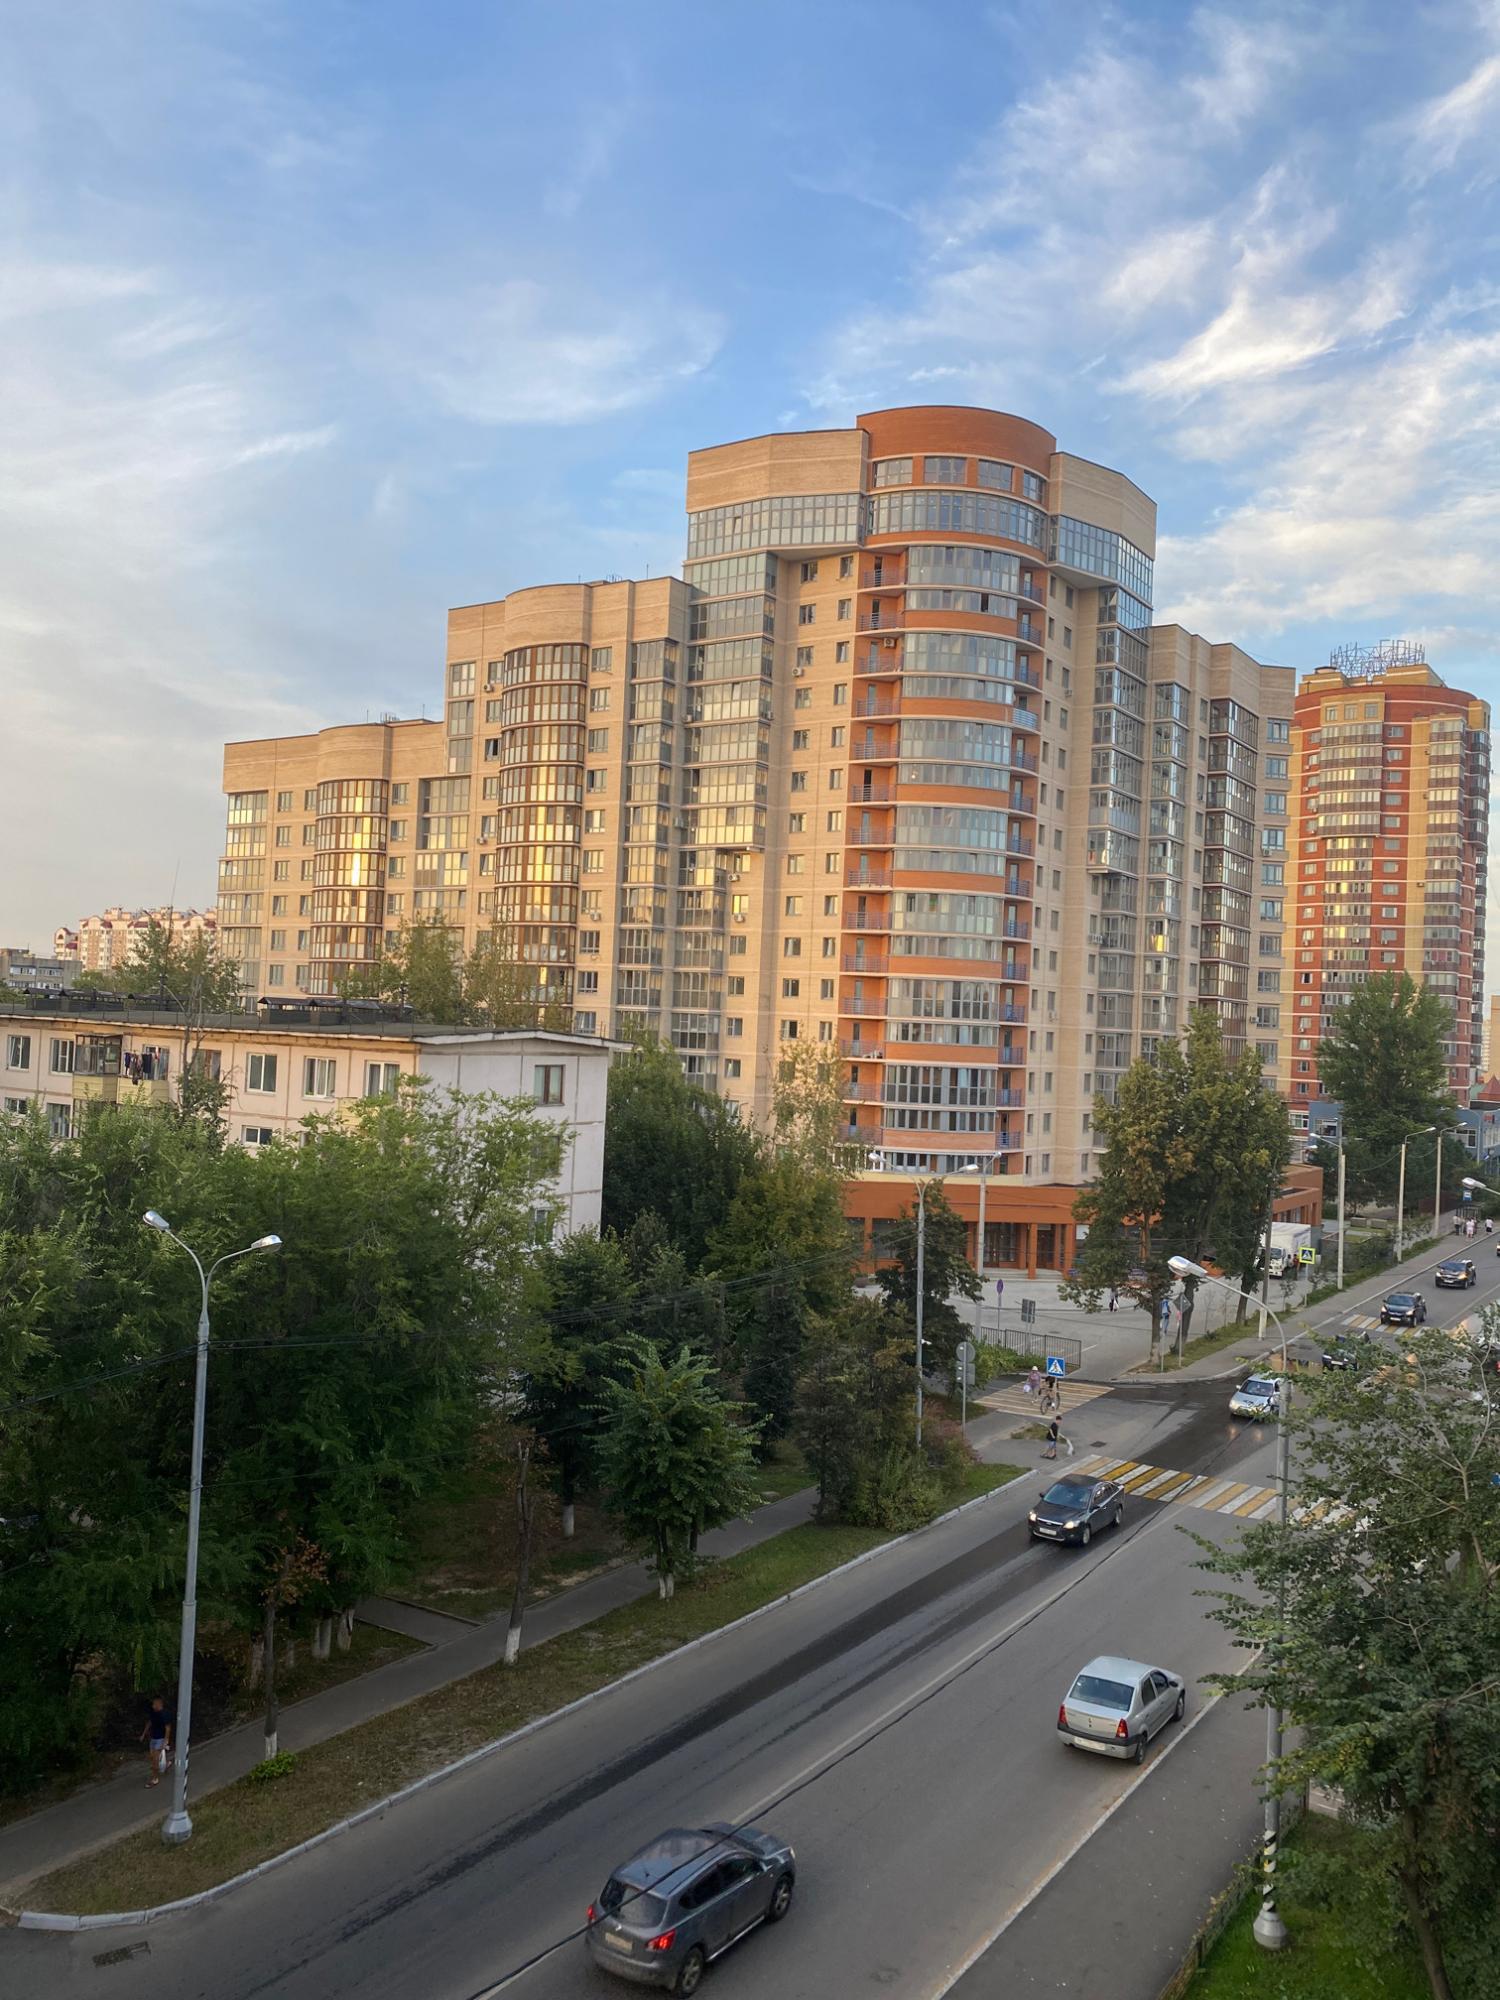 Квартира, 1 комната, 29 м² в Домодедово 89060693194 купить 5